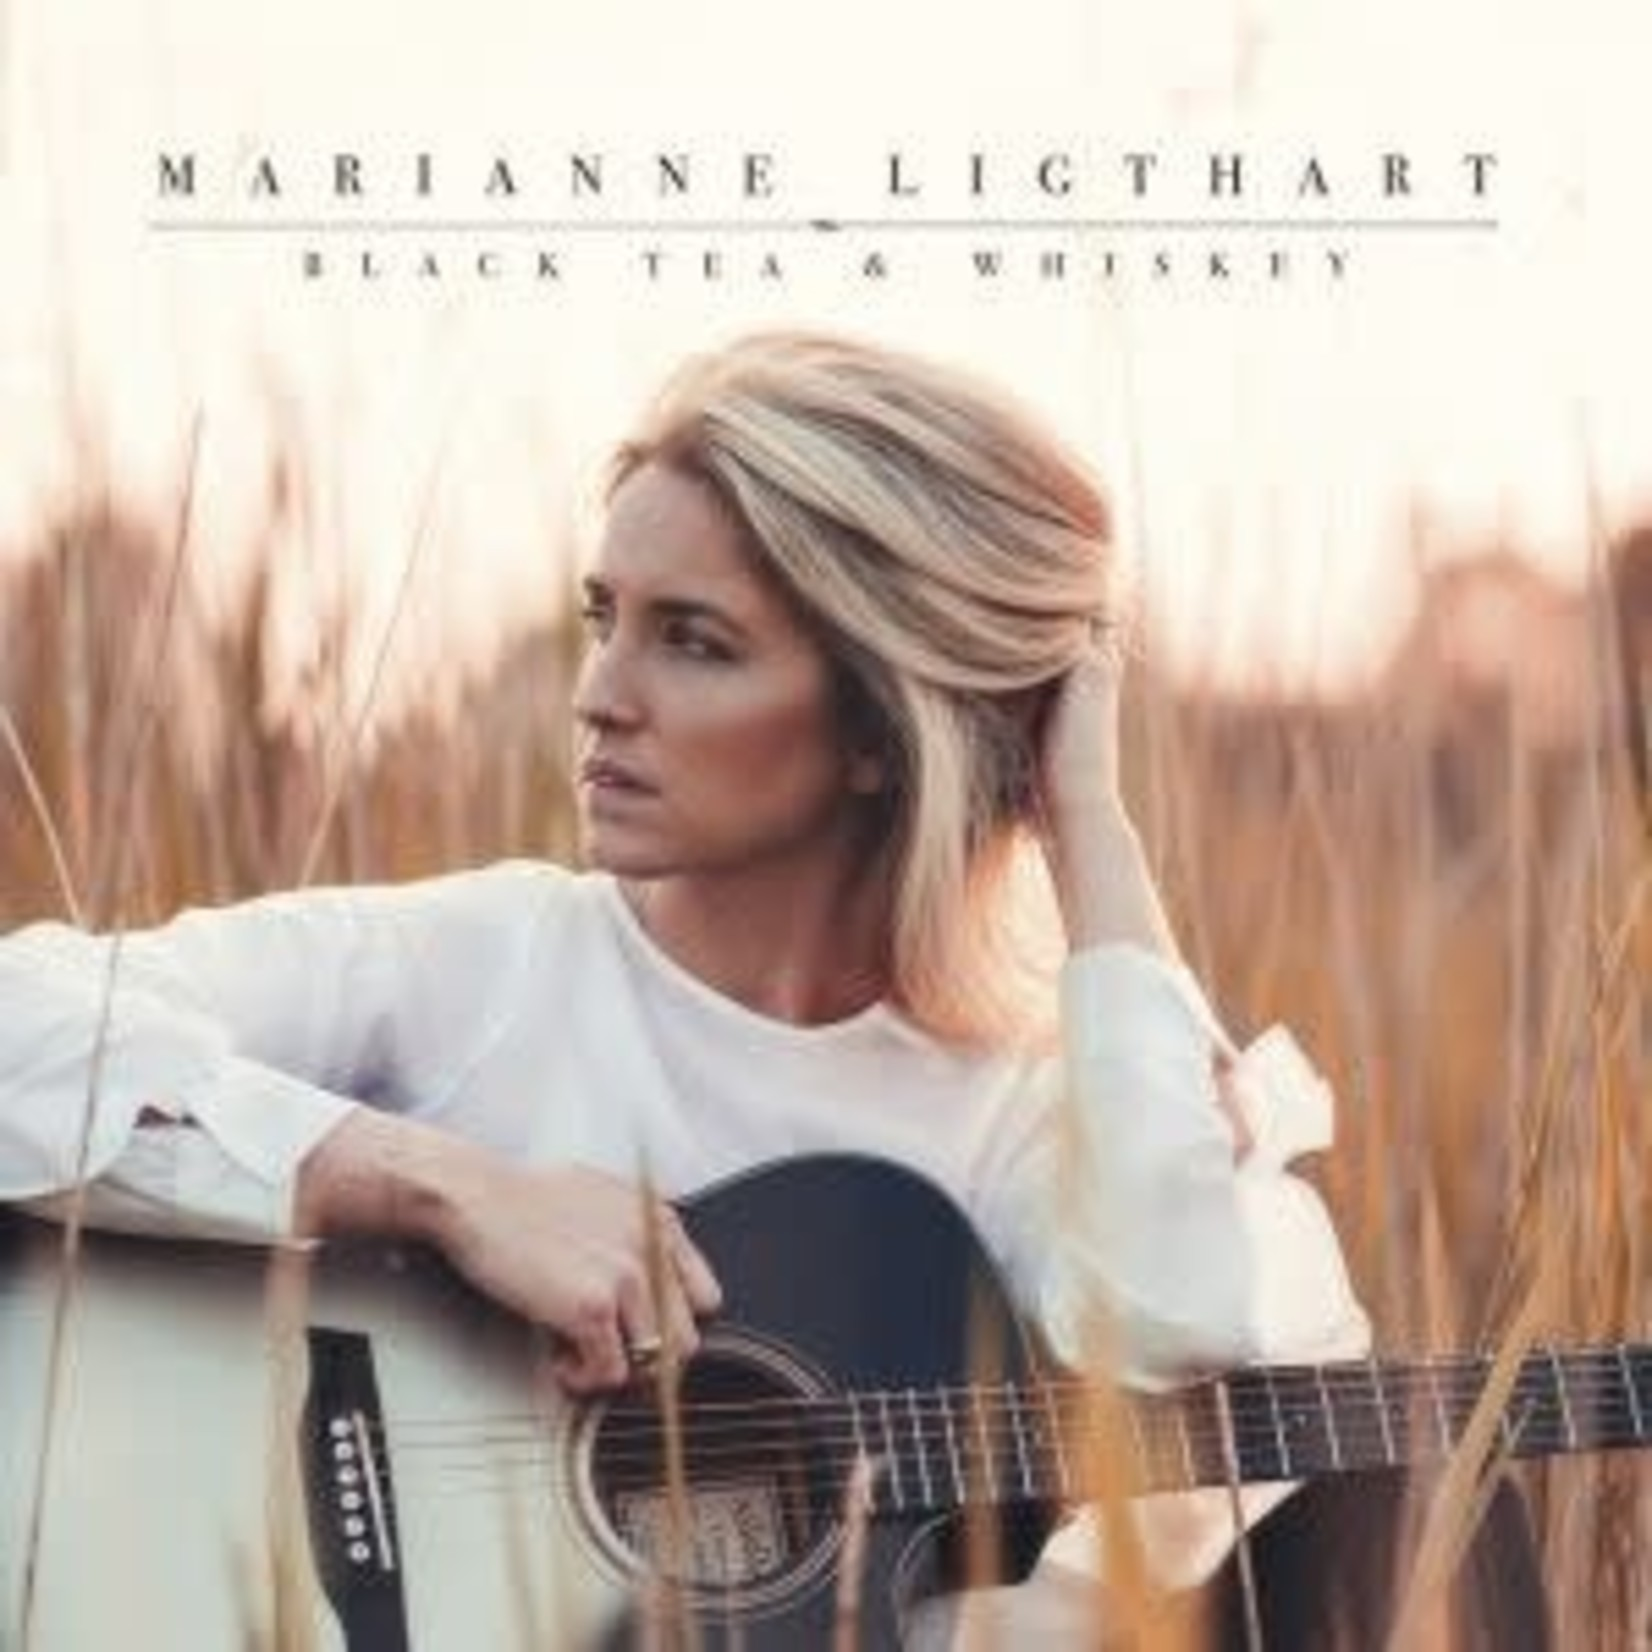 Ligthart_ Marianne - Black Tea & Whiskey (LP) incl. single Let me read you   (VINYL)